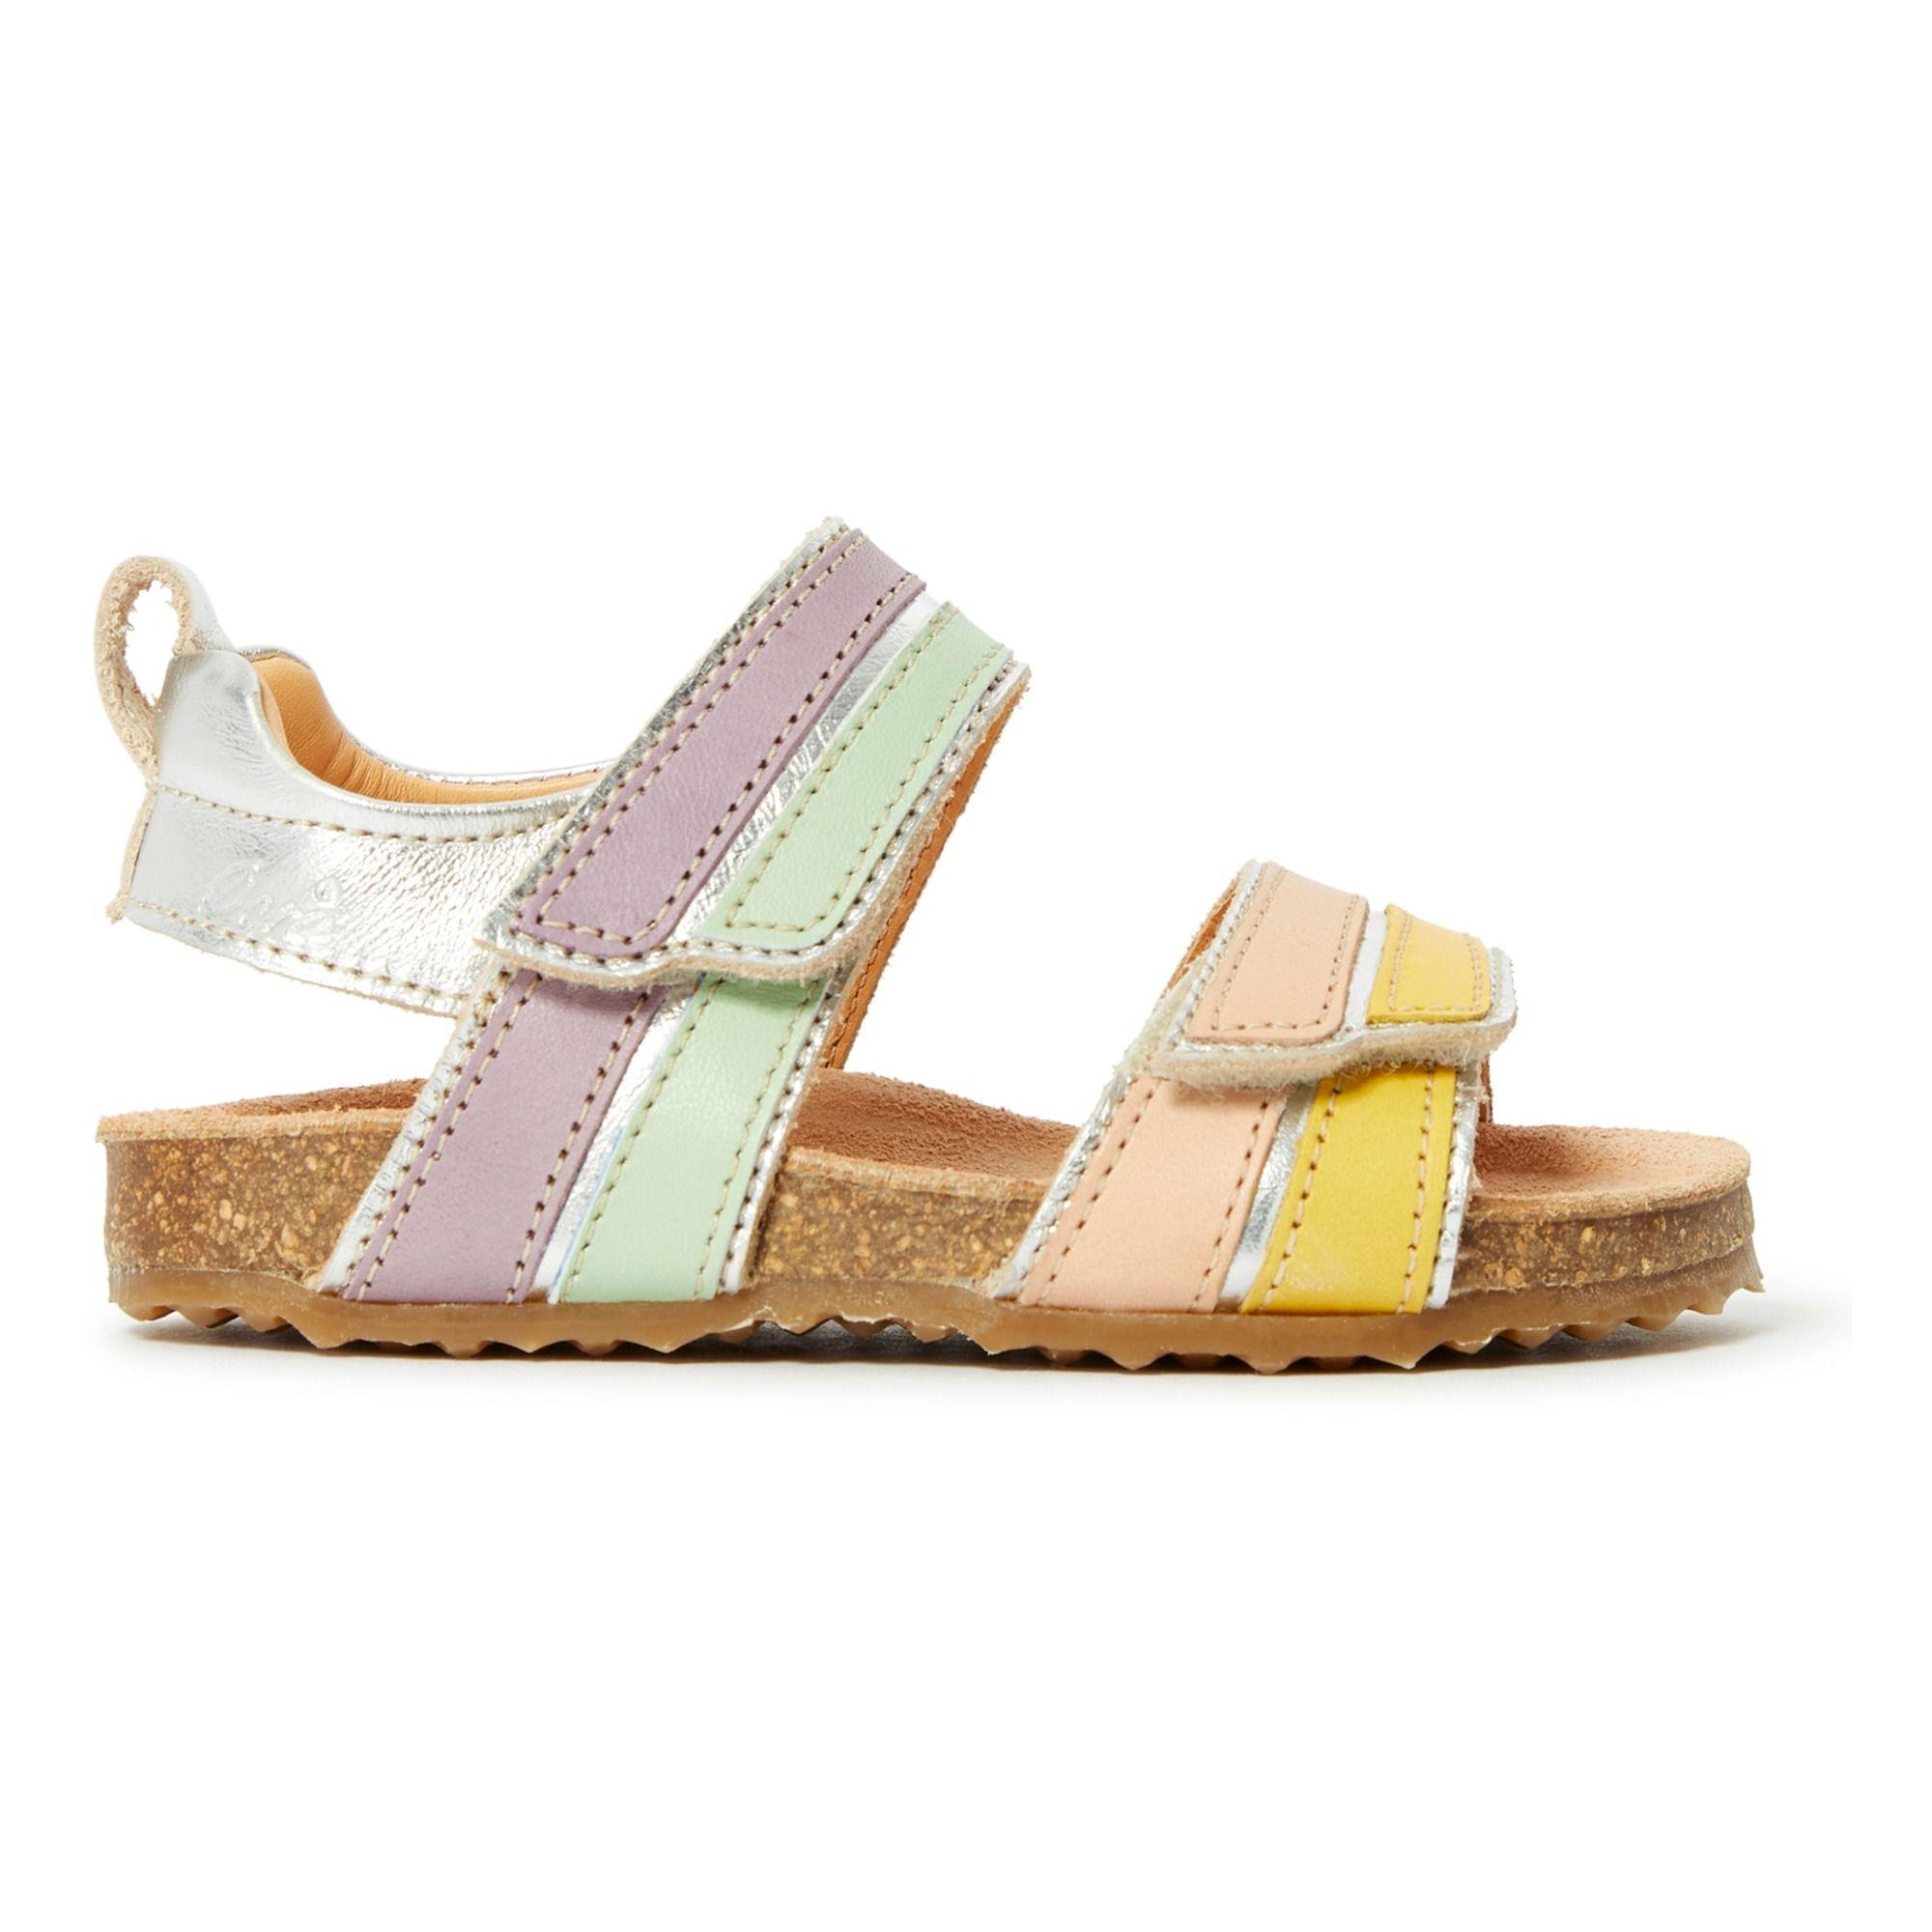 4a8a75ee3e2a4 Velcro Double Sandals Silver | girls sandals | Shoes, Girls sandals ...